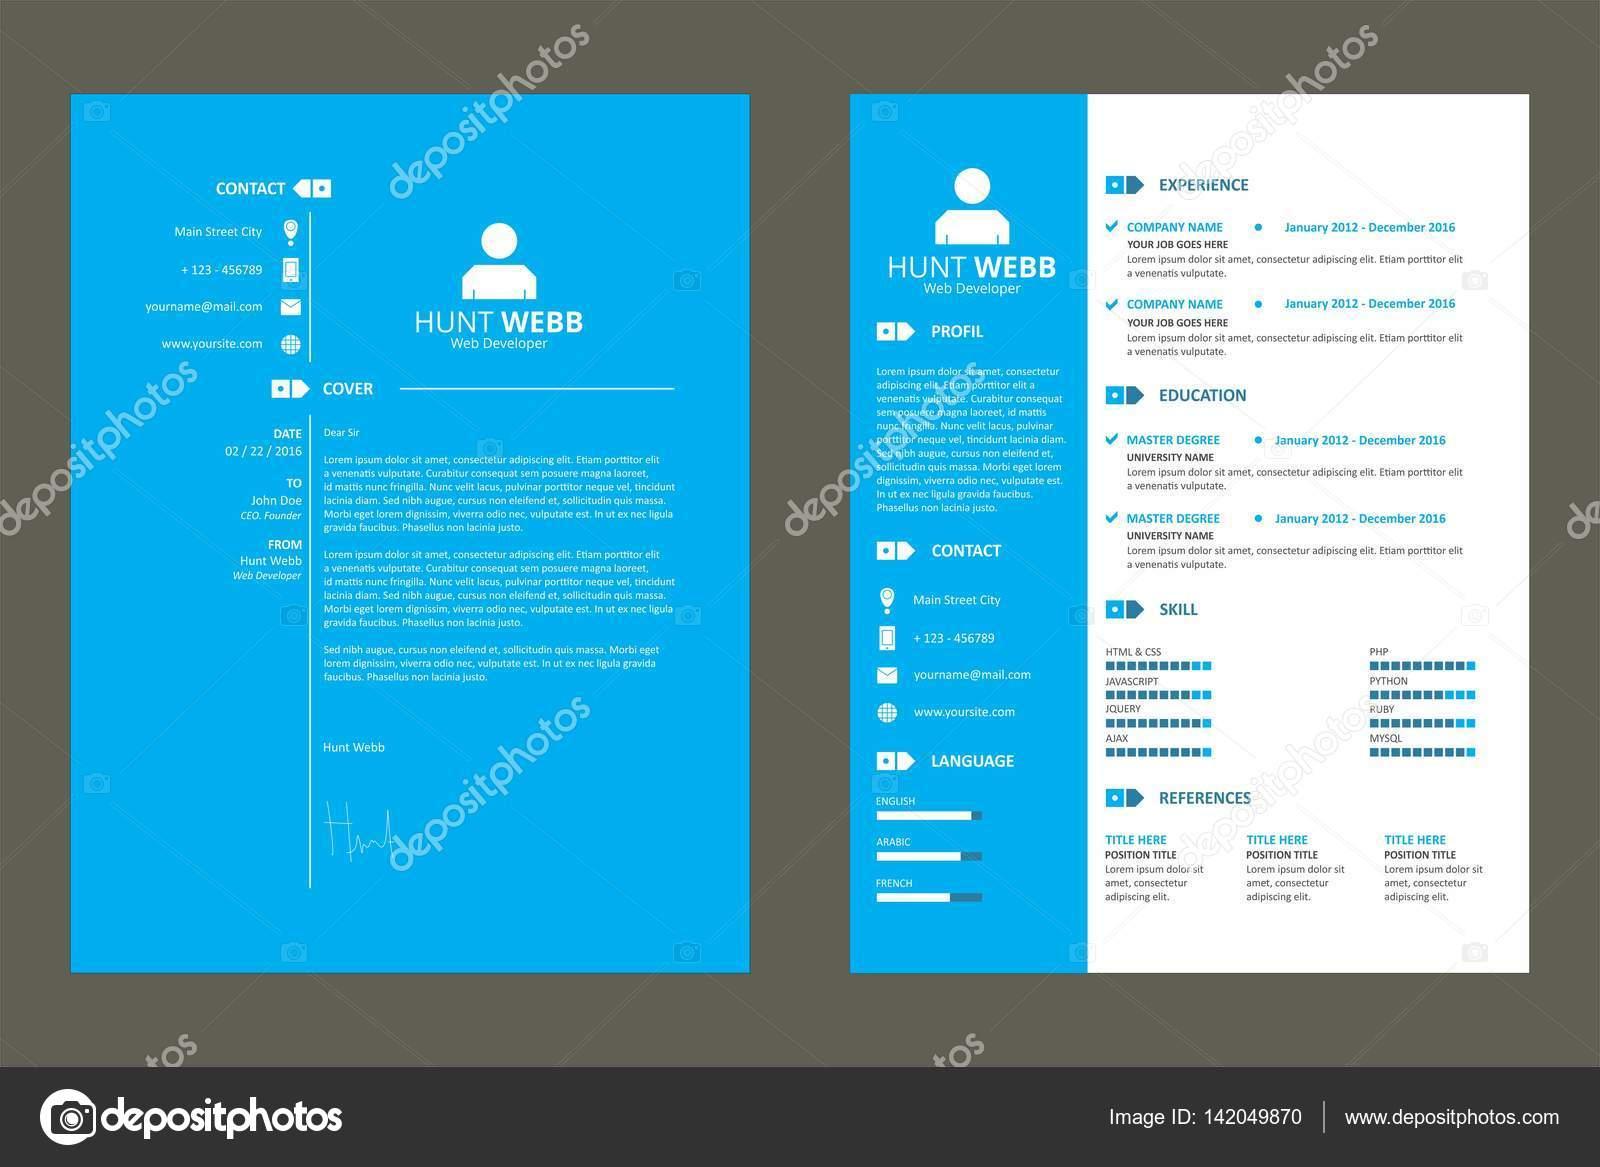 curriculum vitae cv bleu template vecteur  u2014 image vectorielle hendra maroon gmail com  u00a9  142049870